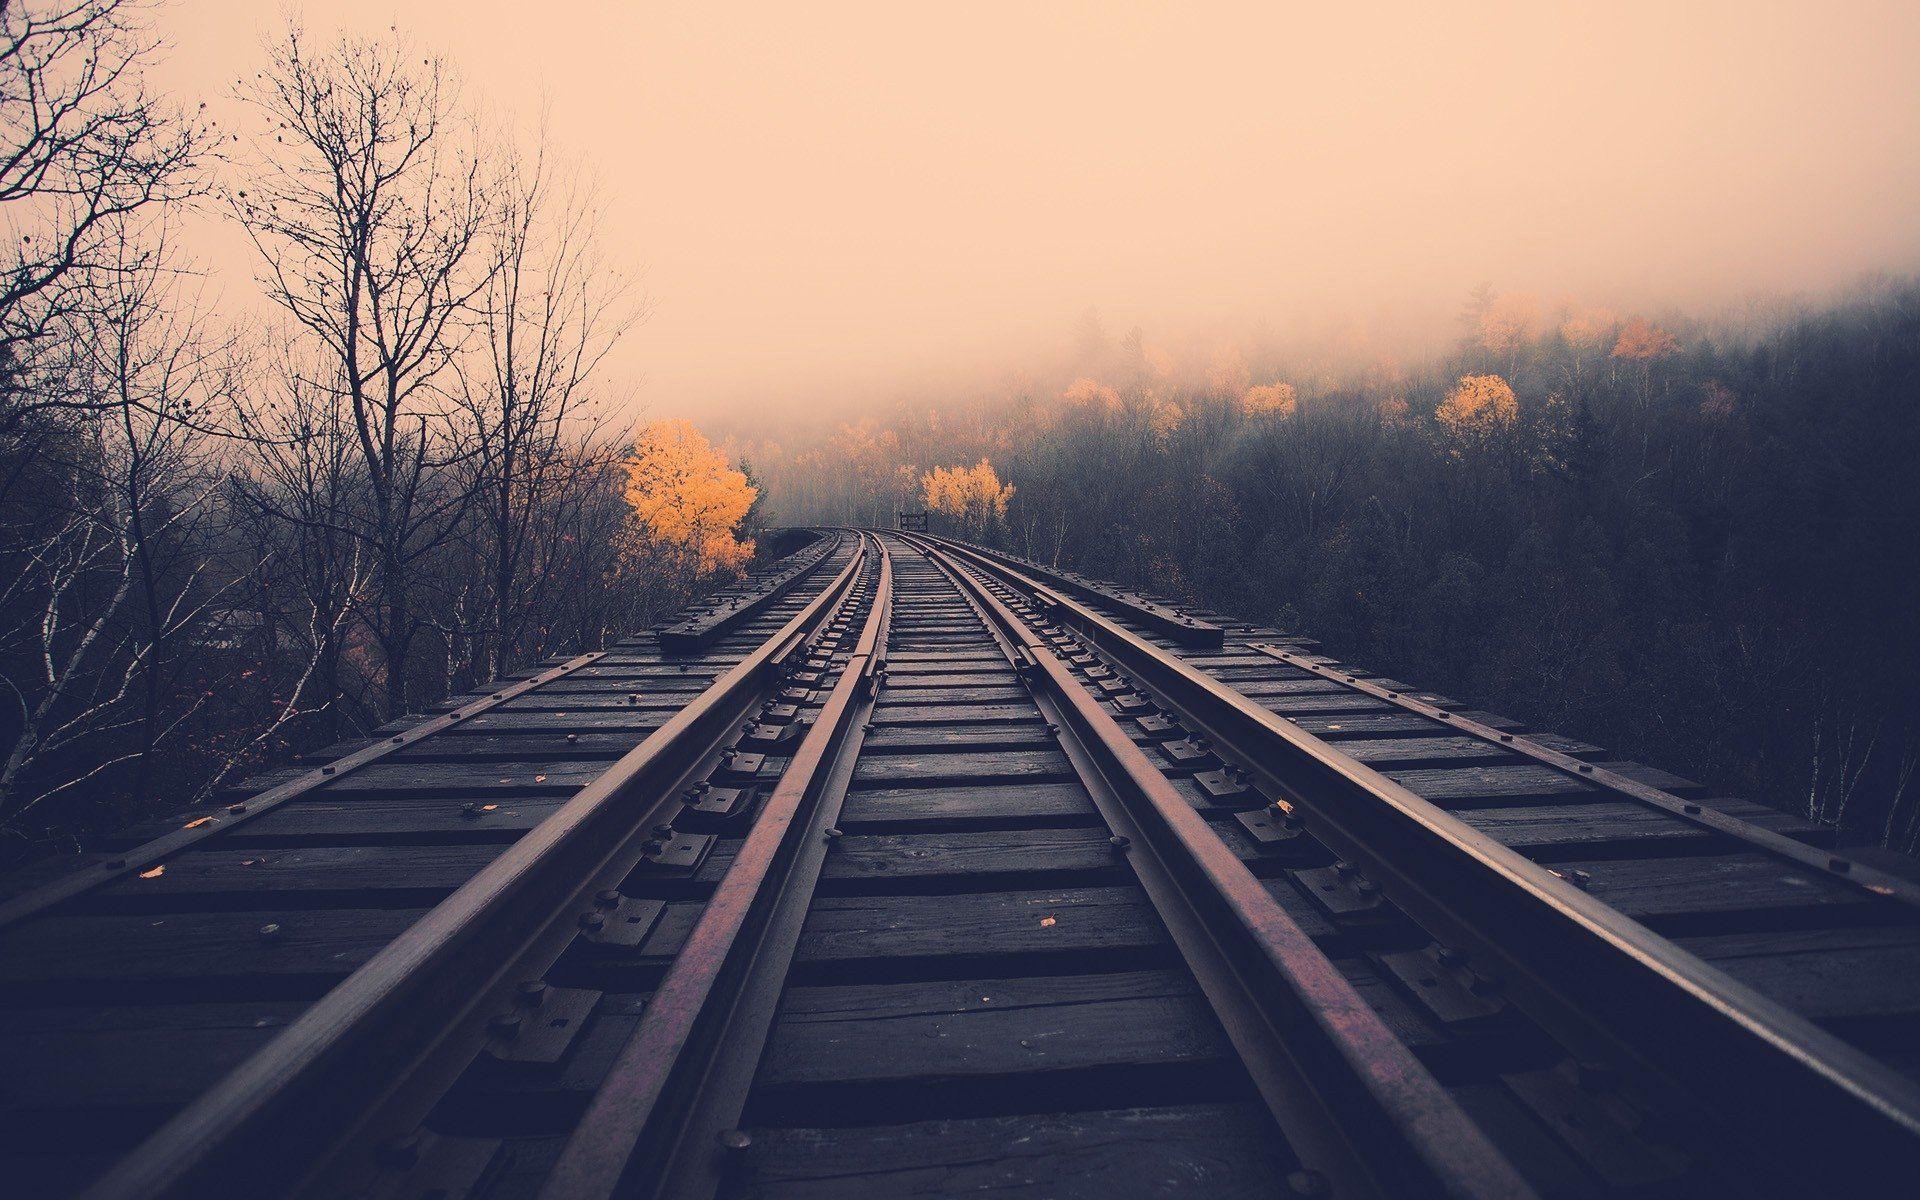 Railway Wallpapers - Top Free Railway